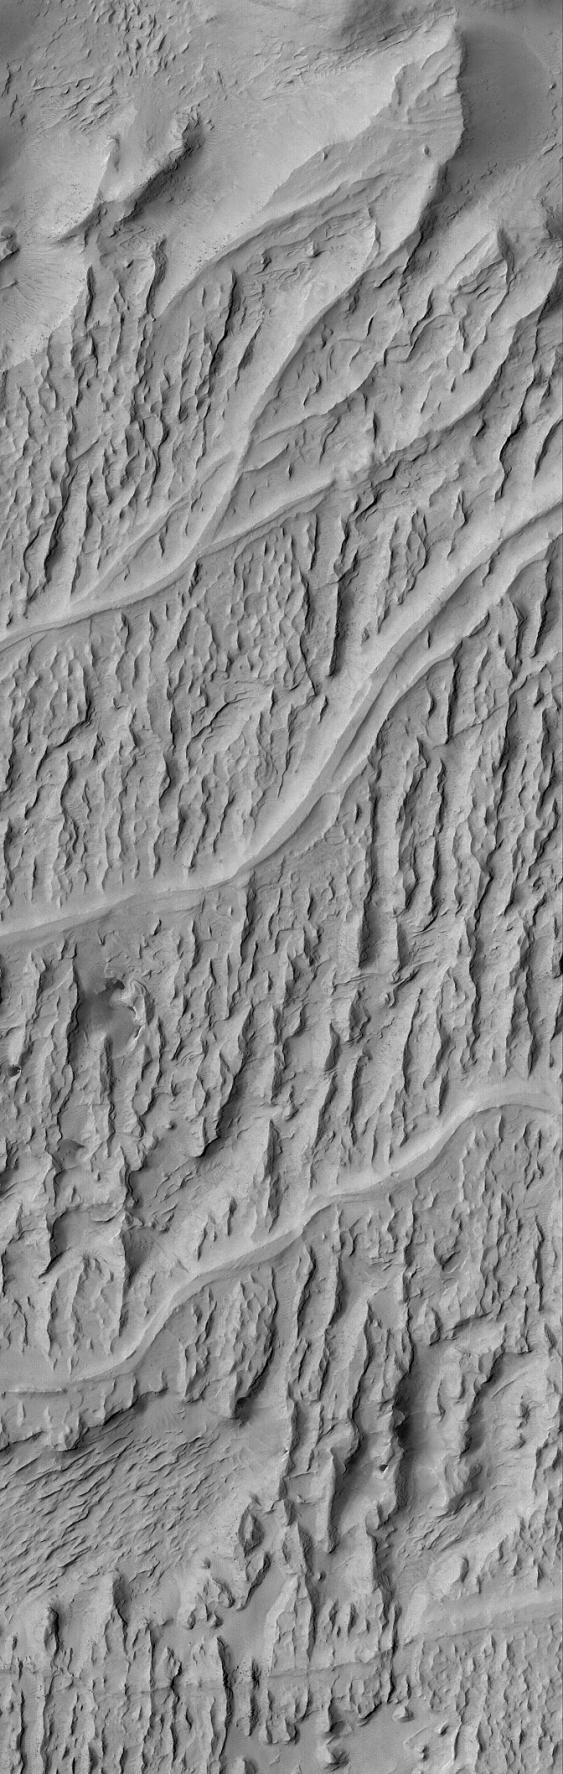 Mars Streambeds